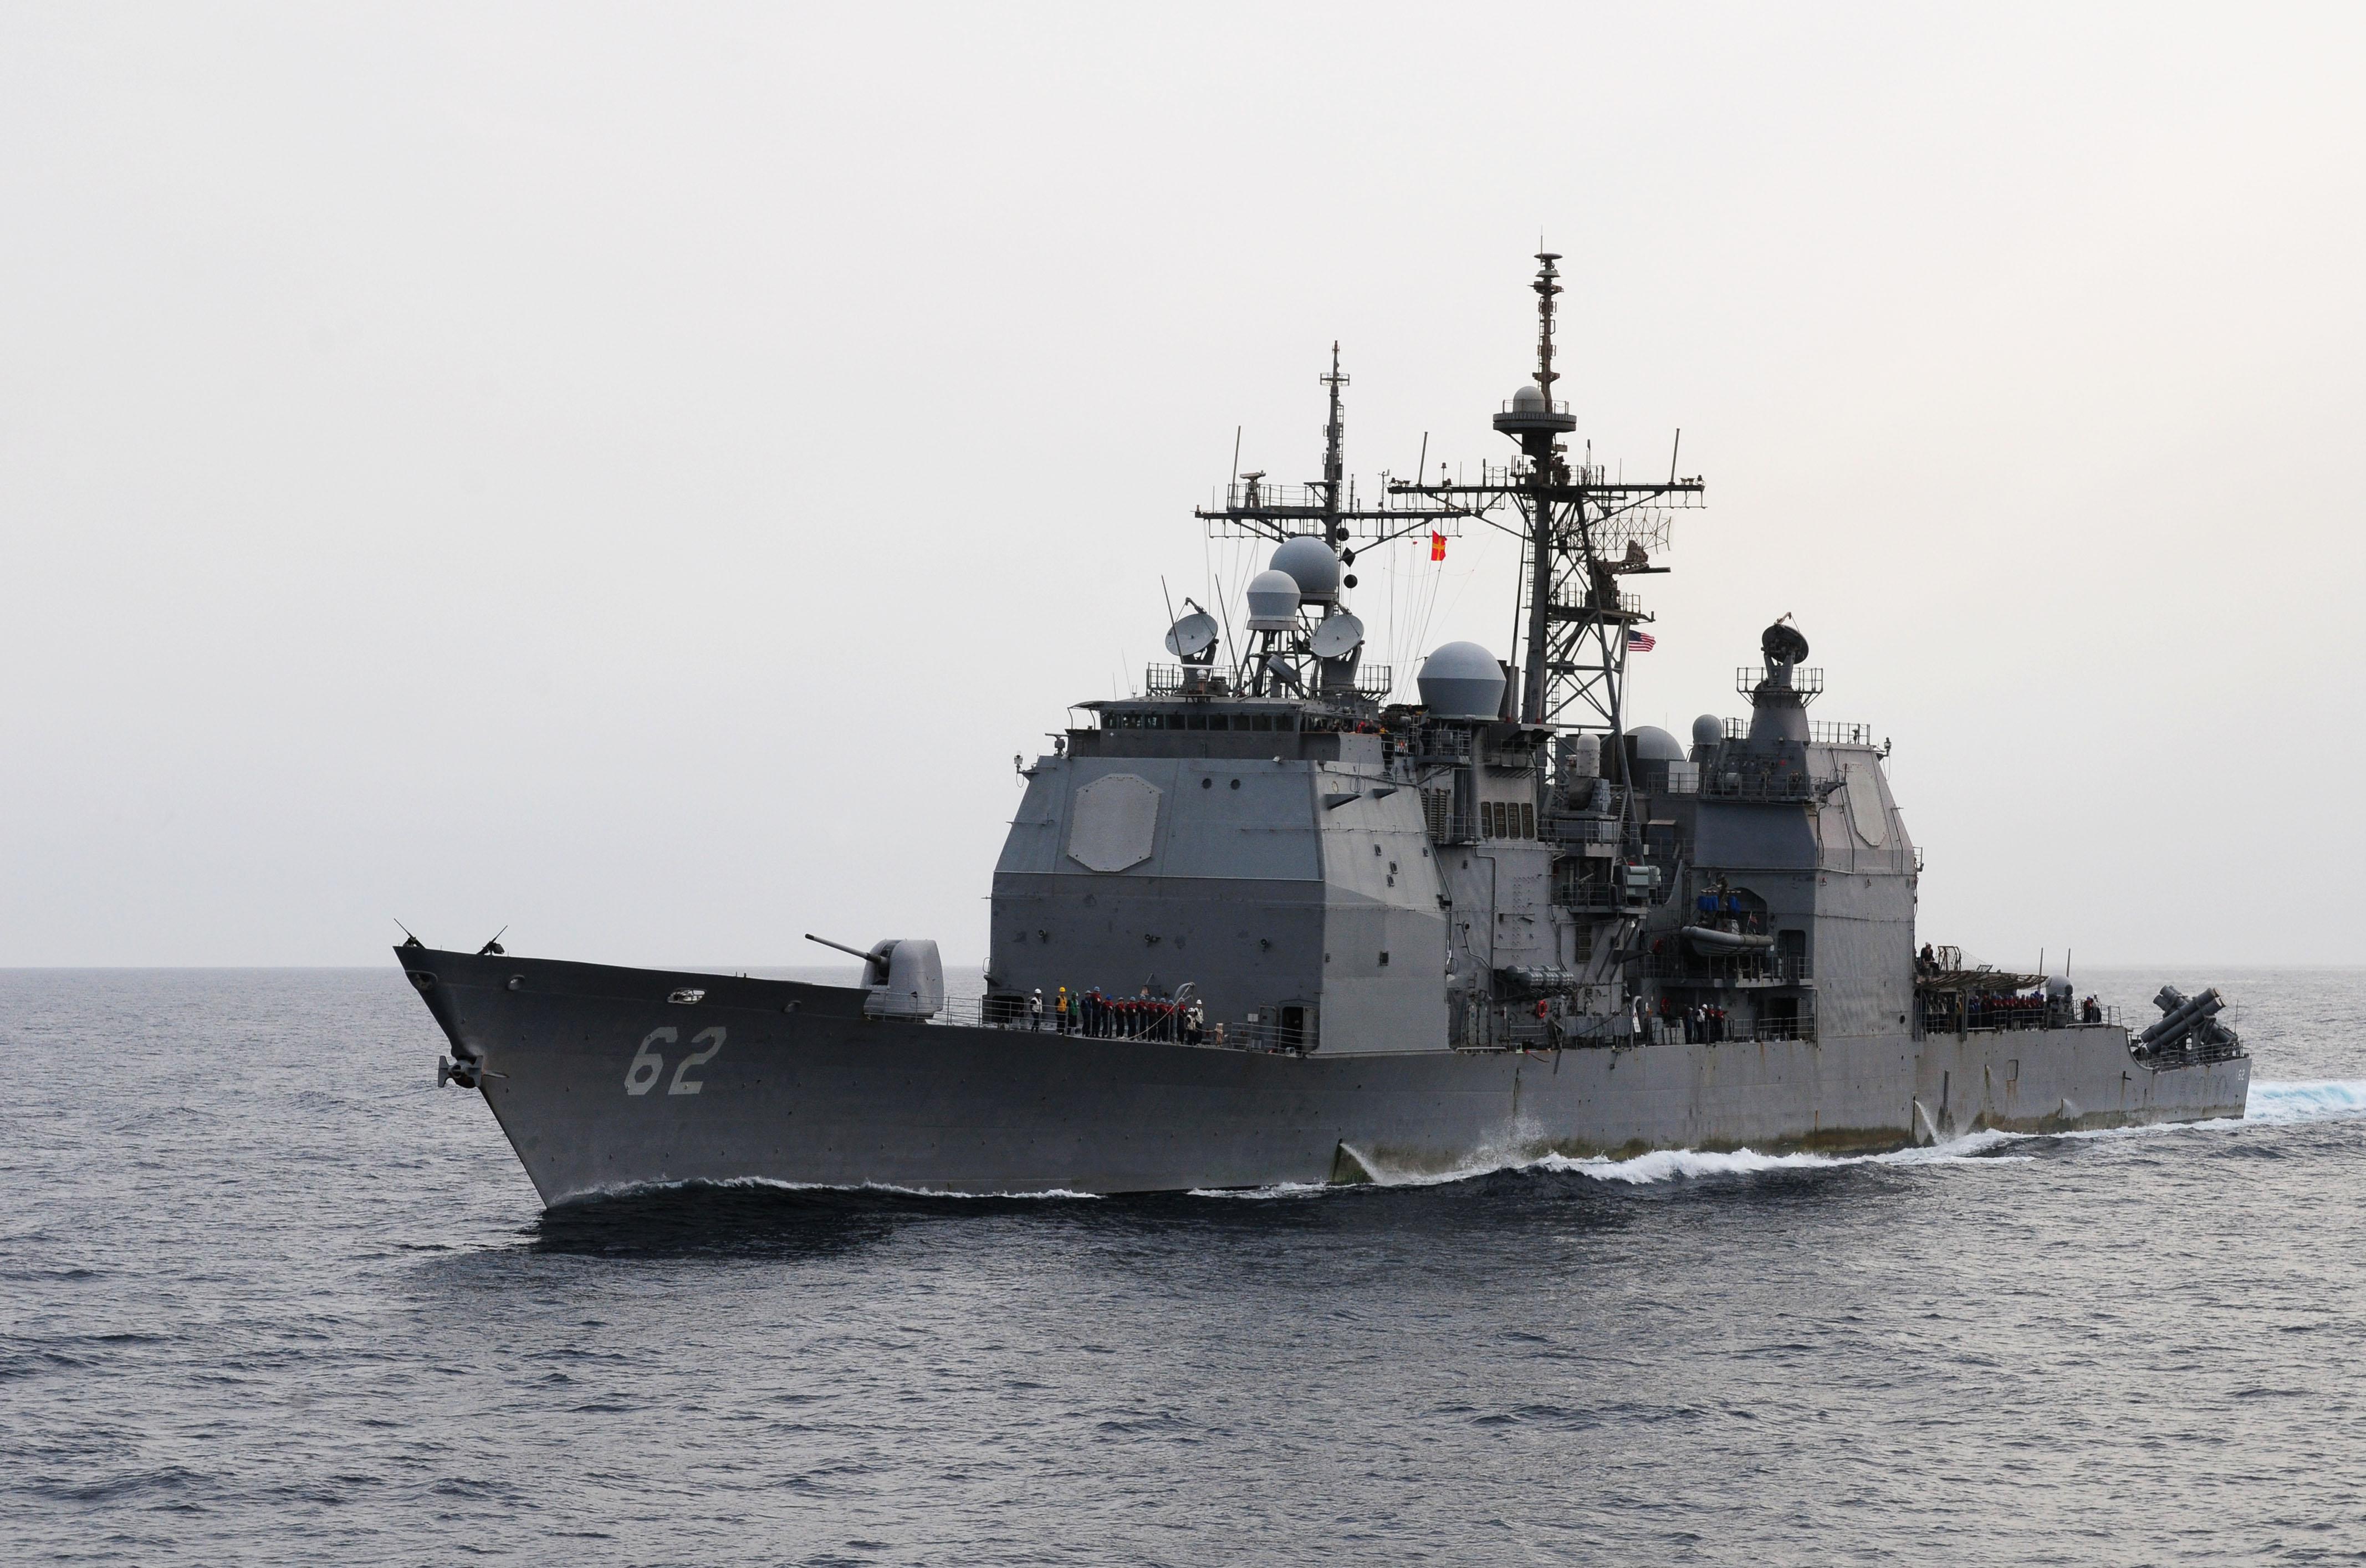 US_Navy_110728-N-SB672-135_USS_Chancellorsville_%28CG_62%29_transits_alongside_USS_Ronald_Reagan_%28CVN_76%29_for_a_fueling_at_sea.jpg